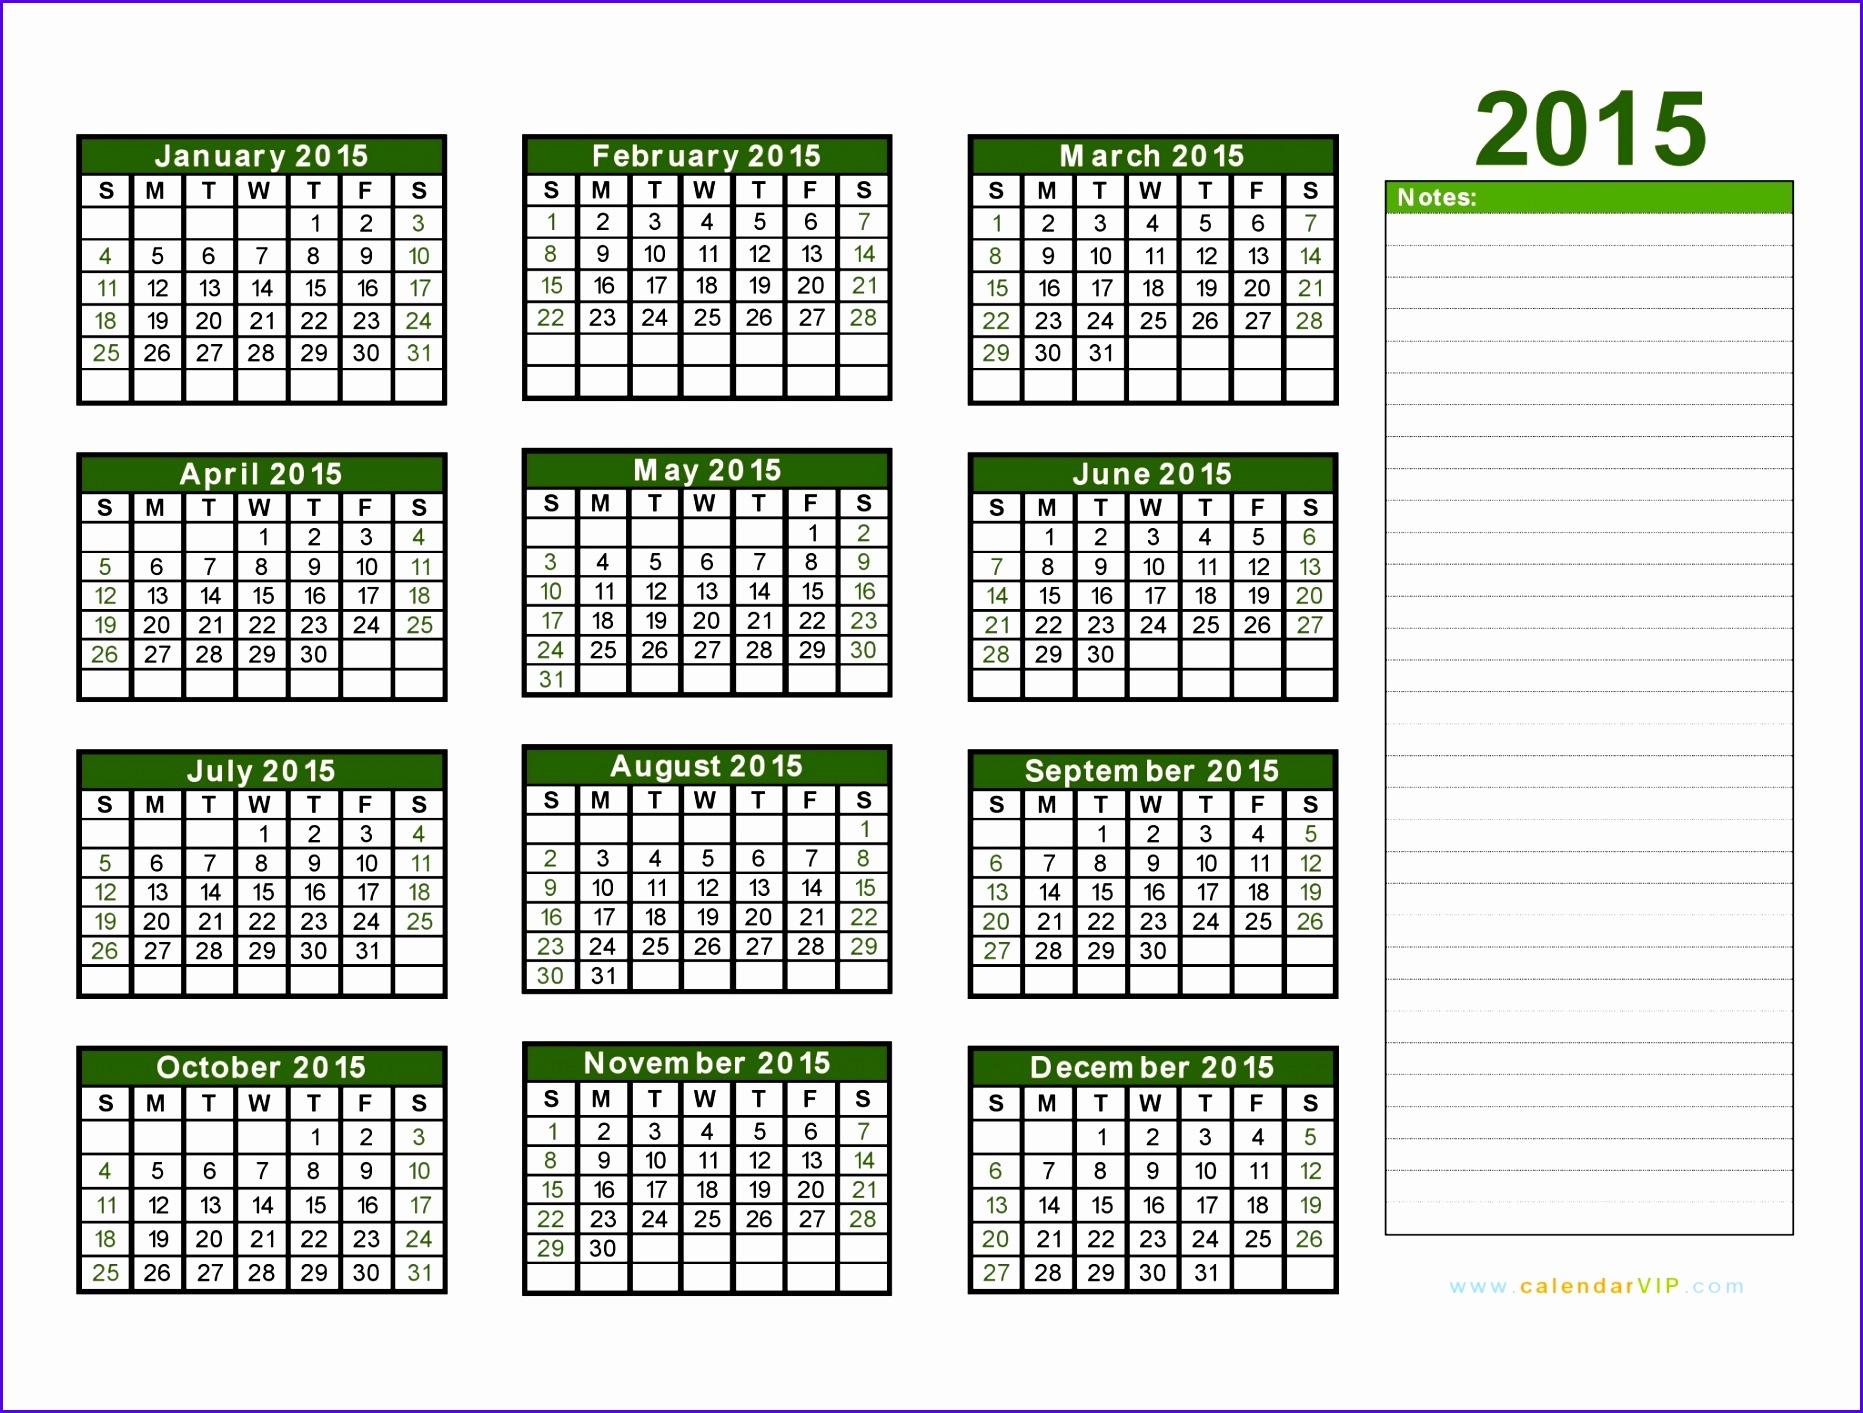 2015 Calendar Template Excel World Letter Format Free Blank Printable In Pdf Word Rega Calendar 18631413